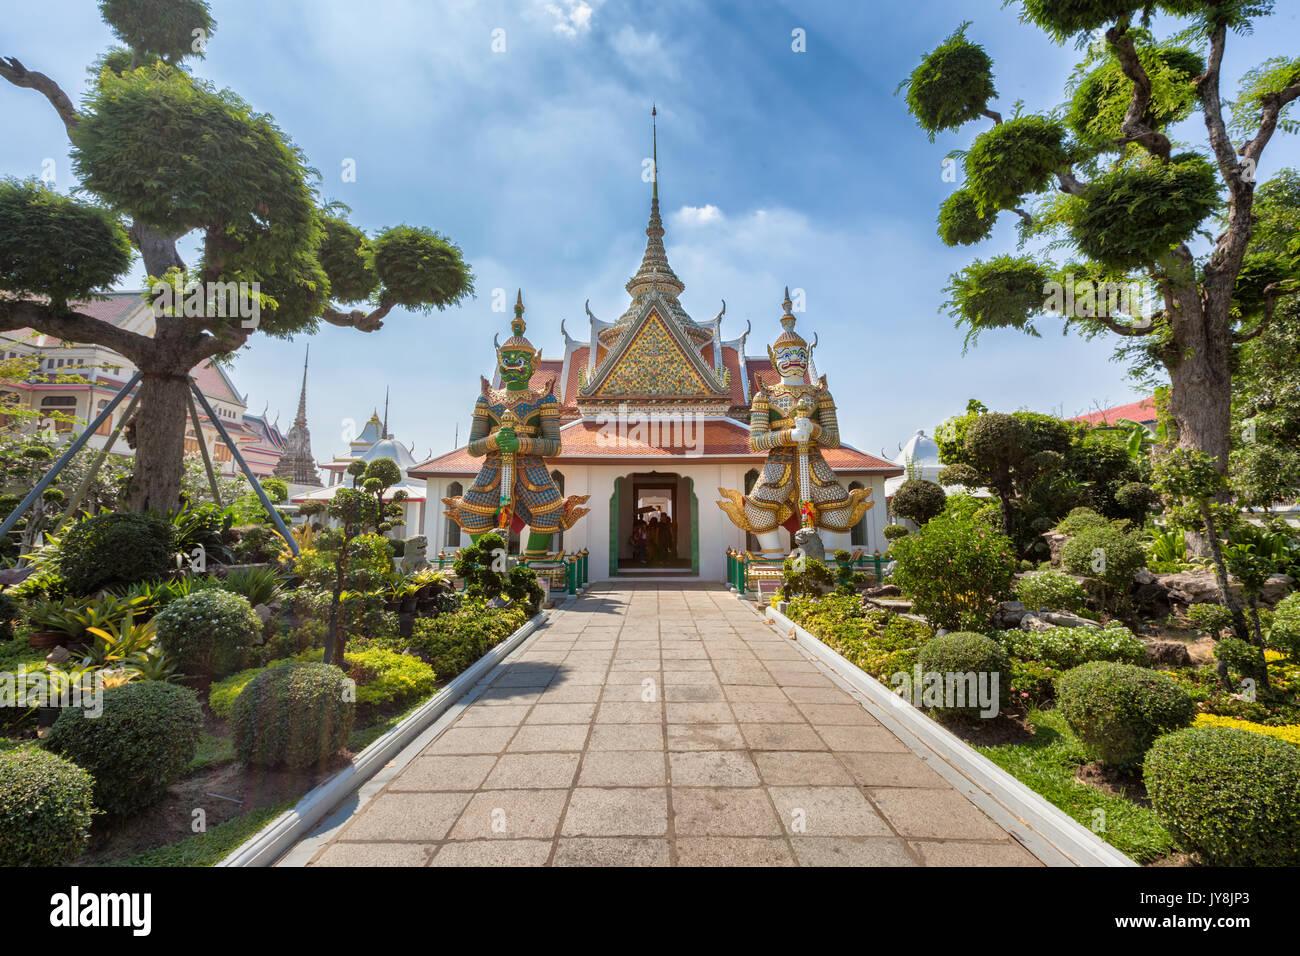 Demone gigante statue custode presso l'entrata di Wat Arun, Bangkok, Thailandia Immagini Stock